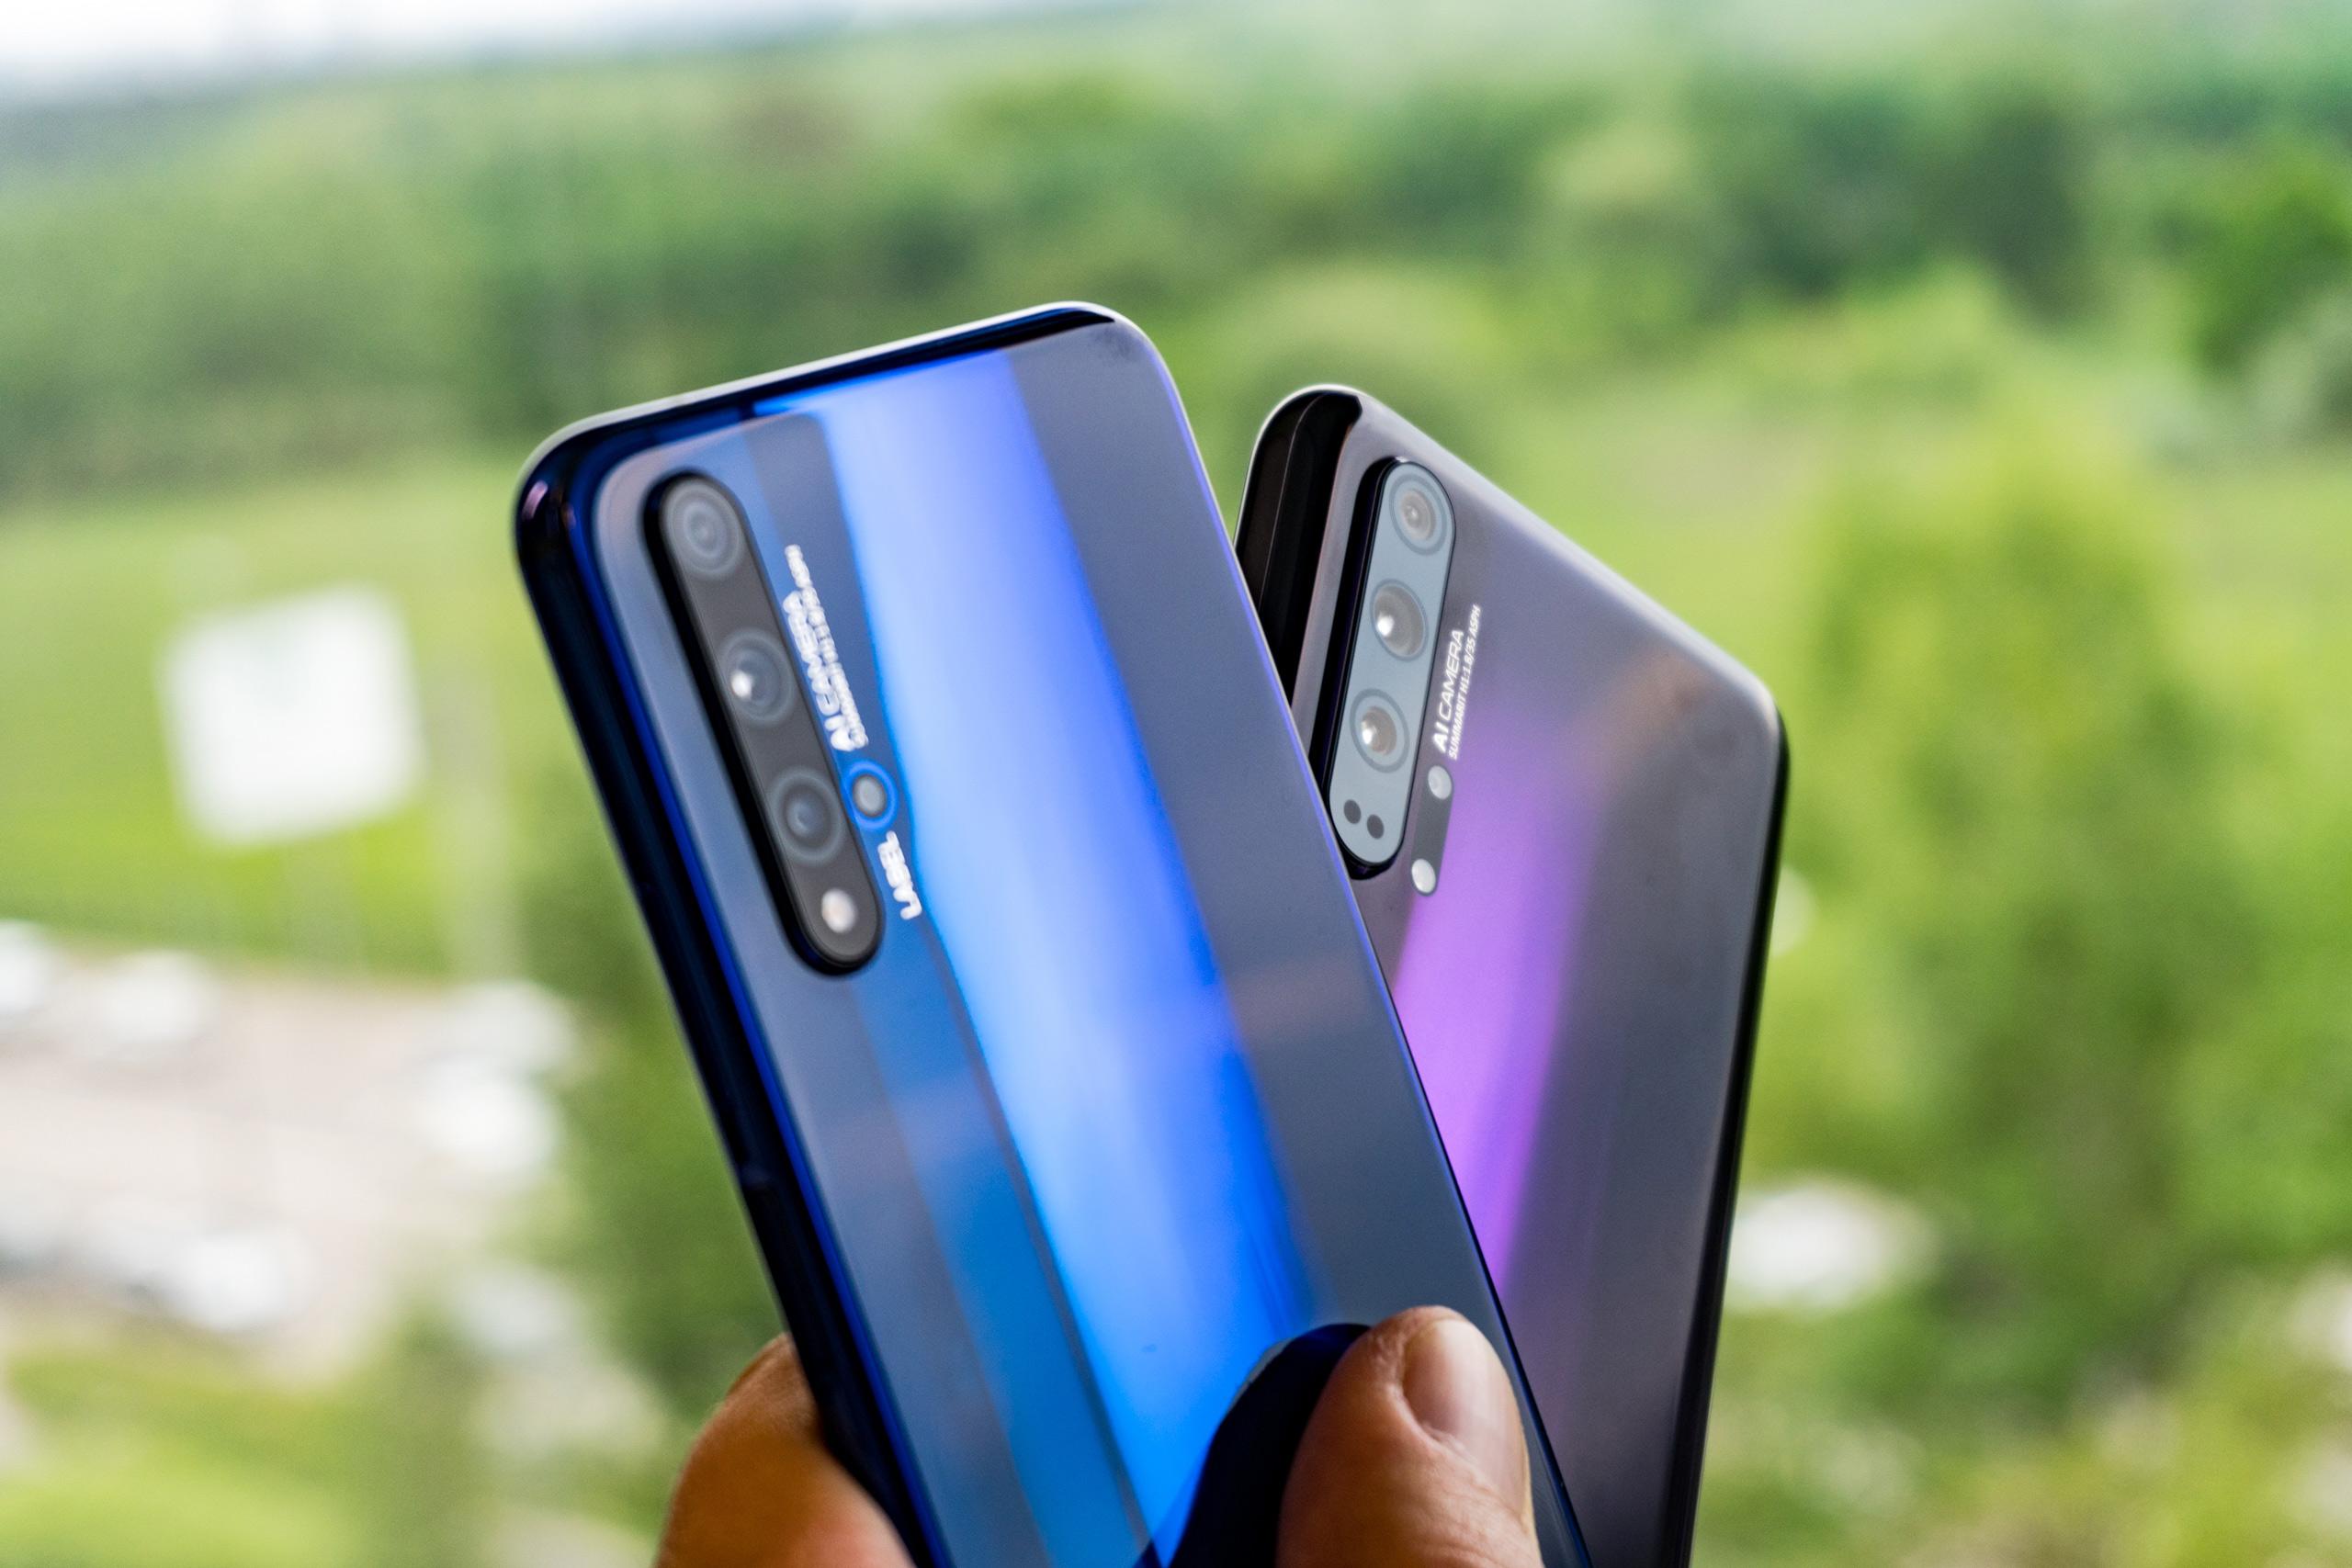 7 смартфонов флагманов 2019 года - два смартфона Honor 20